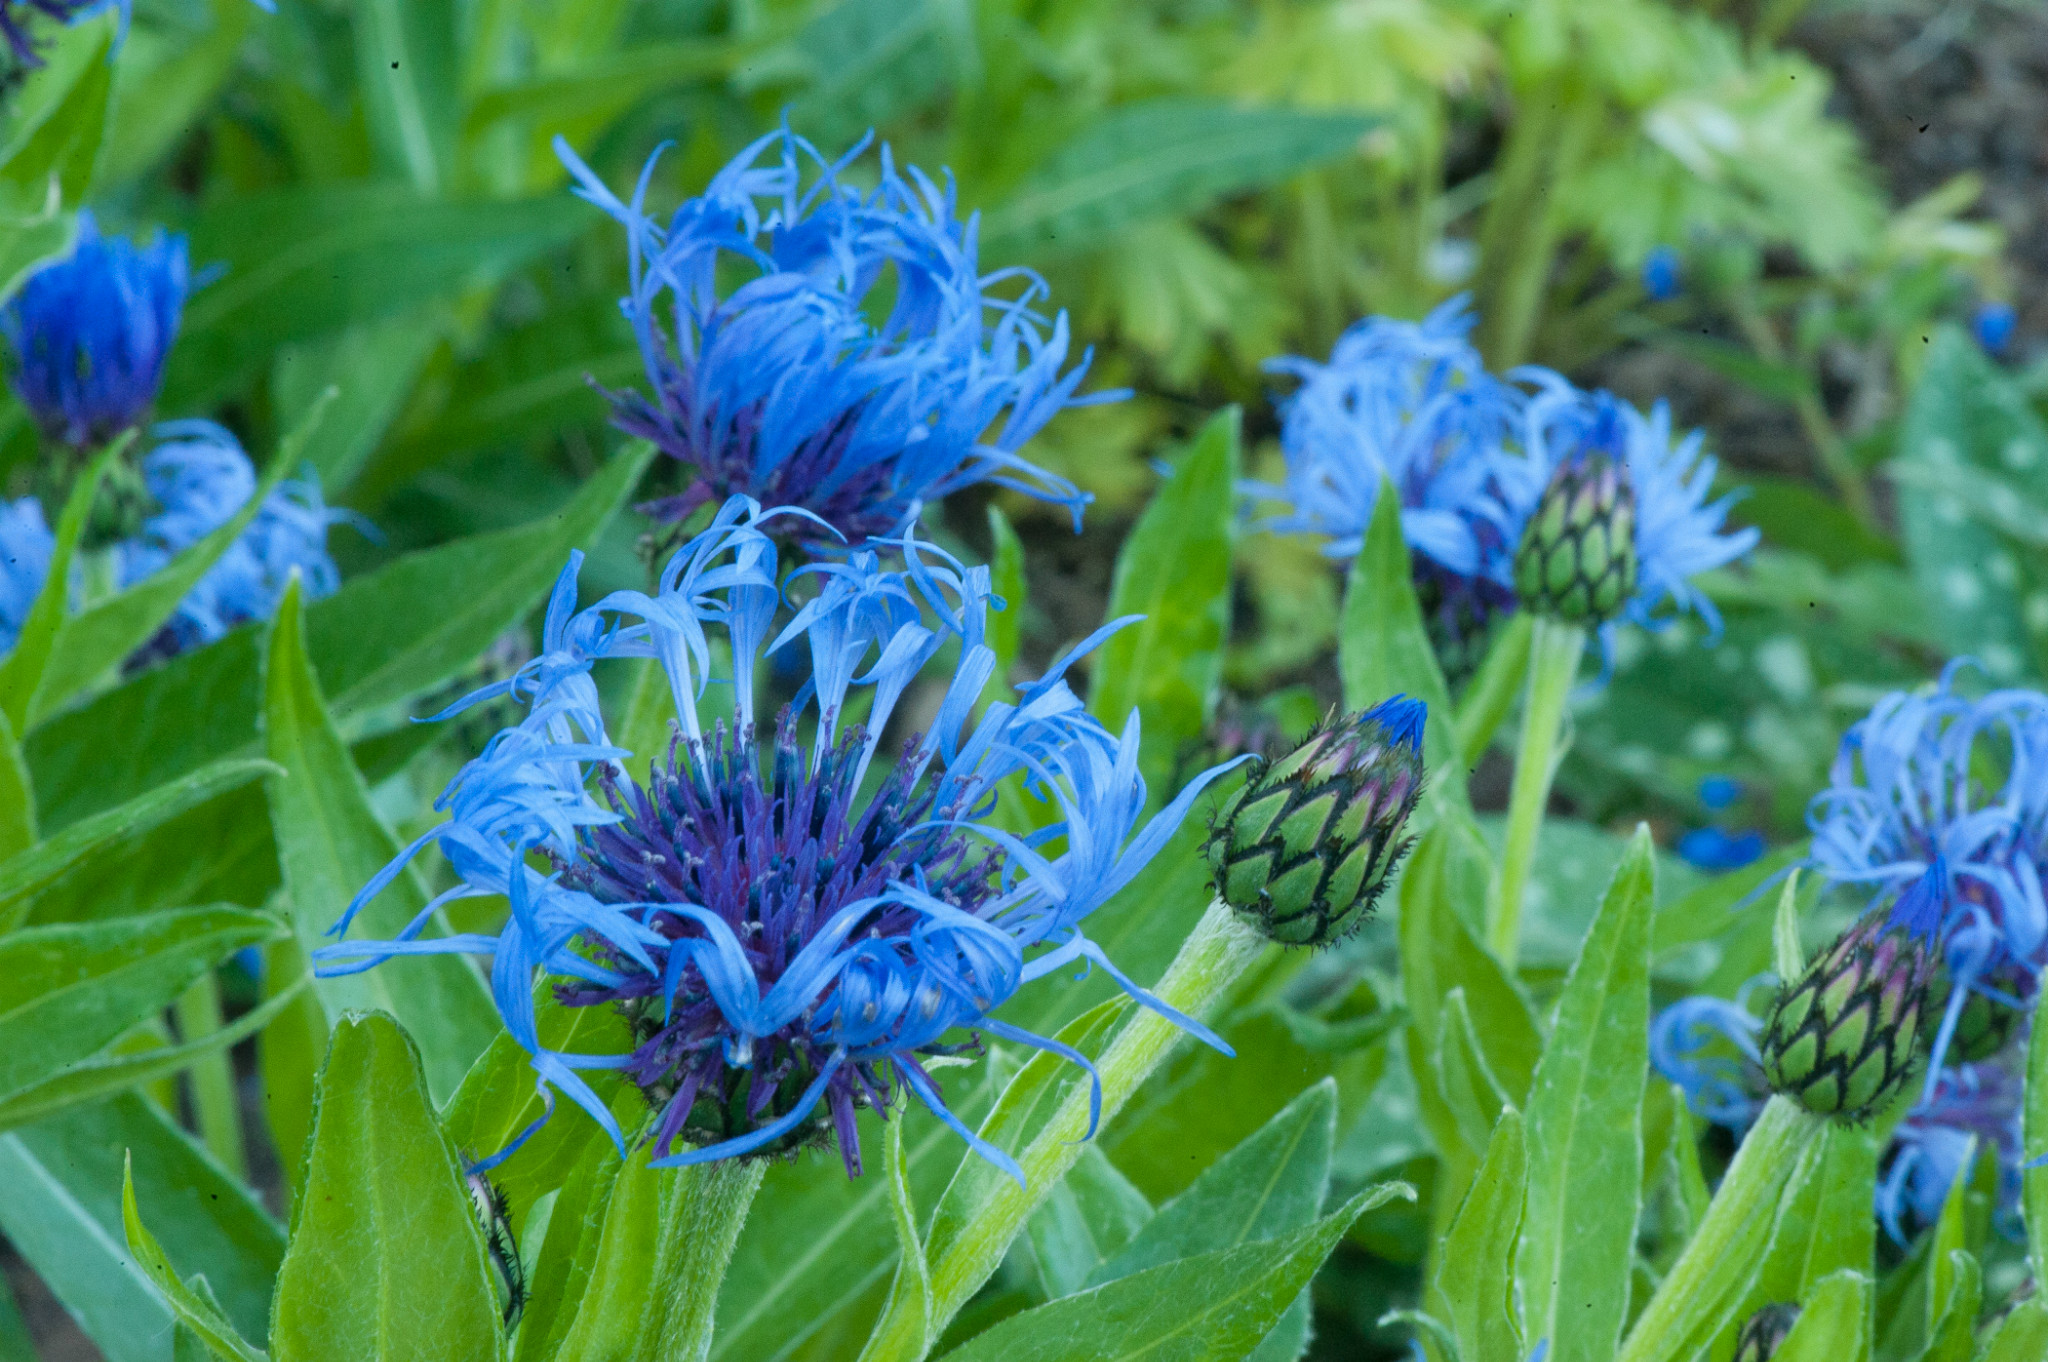 Photo: Centaurea montana, mountain bluet